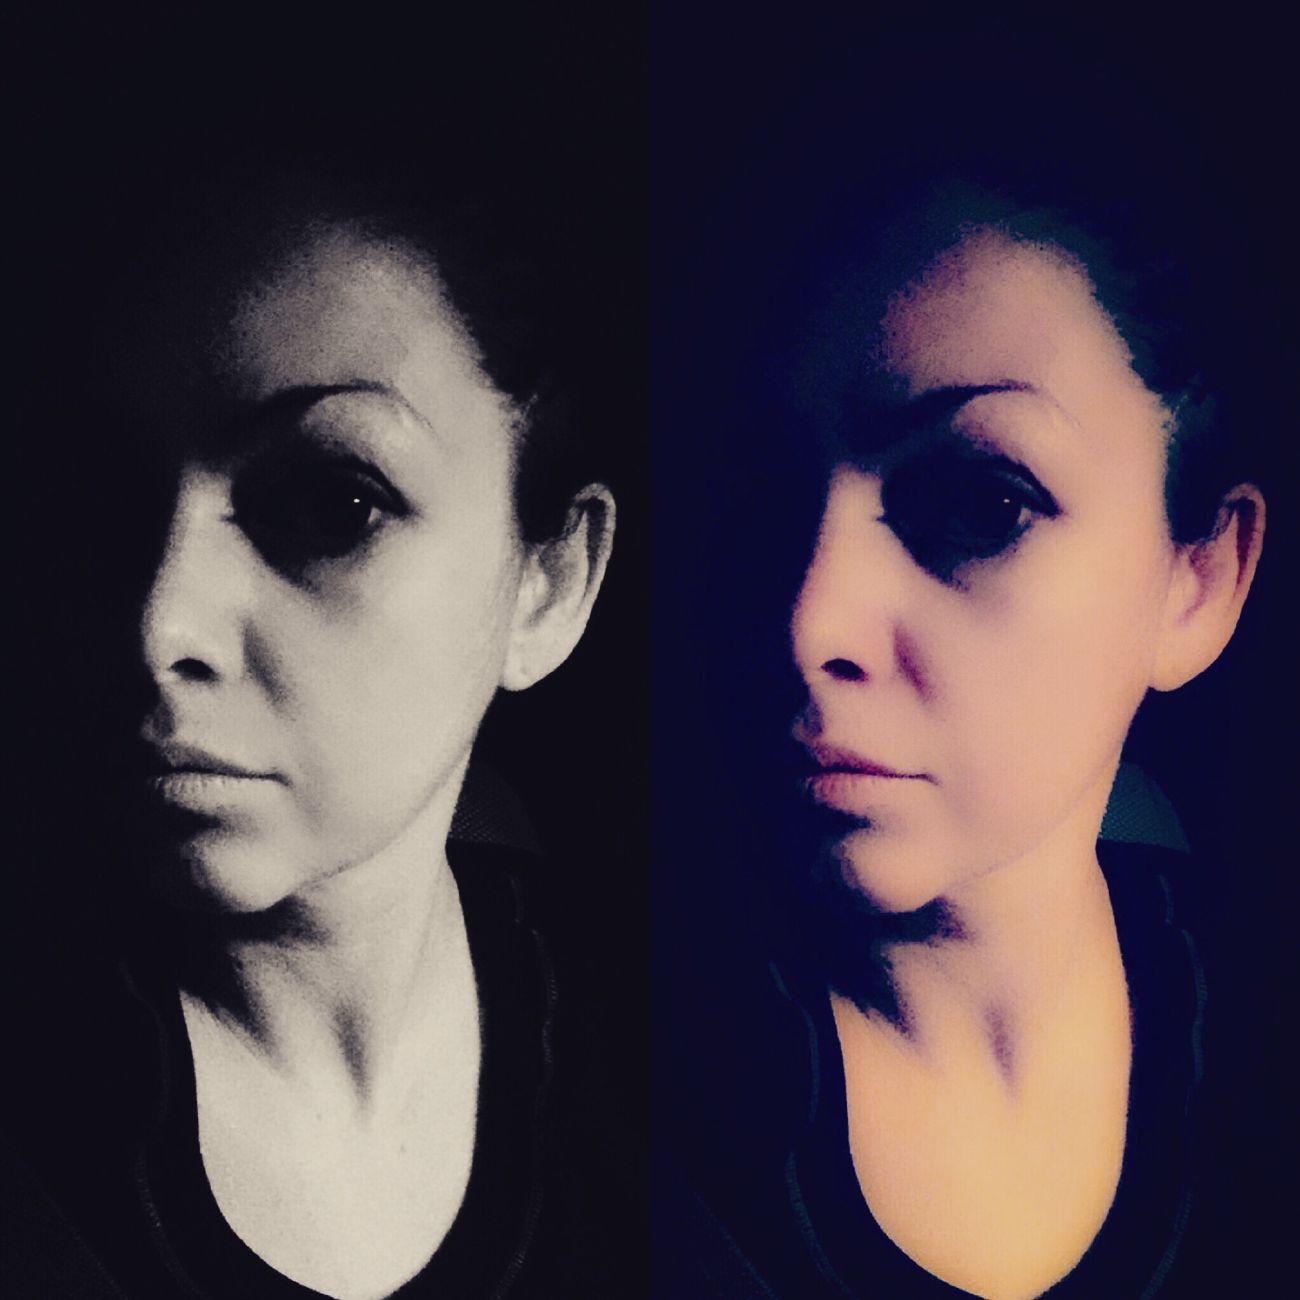 Seifie LoveYourSelf ♥ Blackandwhite Beautiful